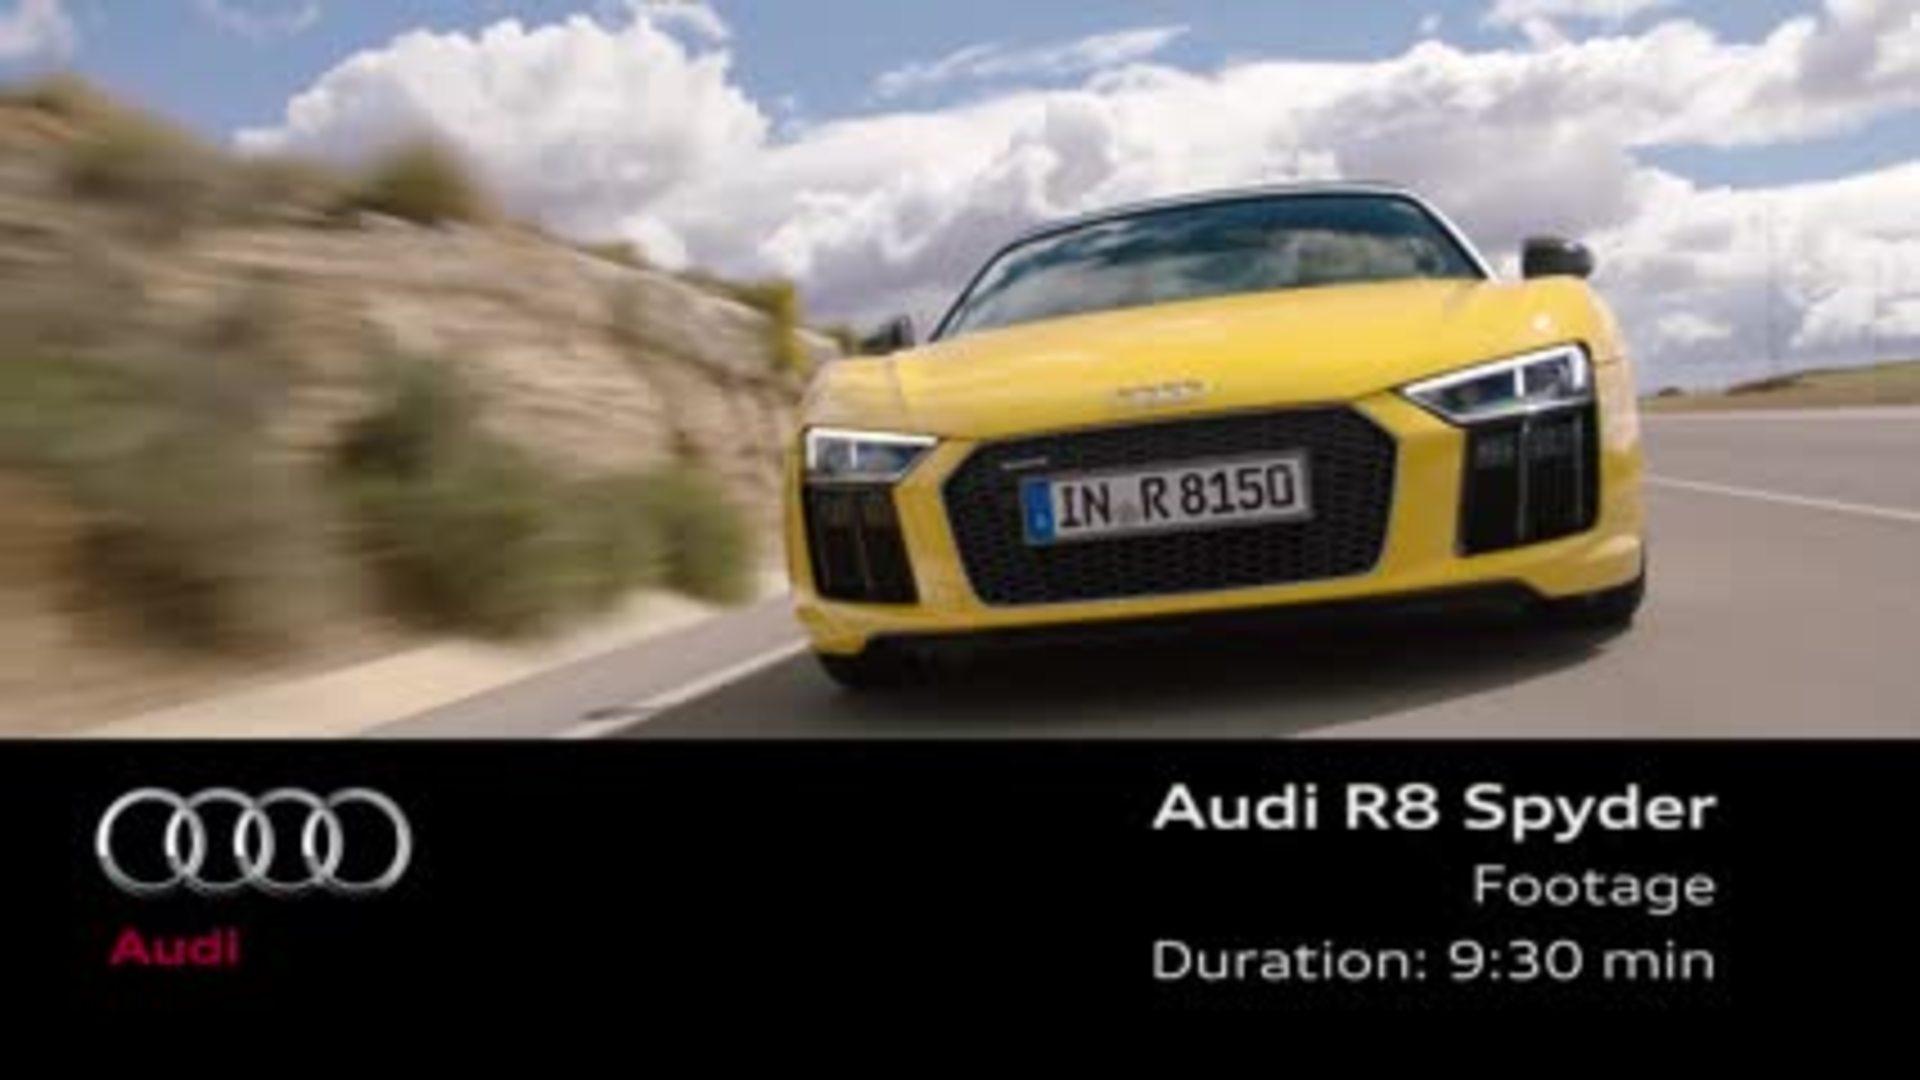 Audi R8 Spyder V10 - Footage